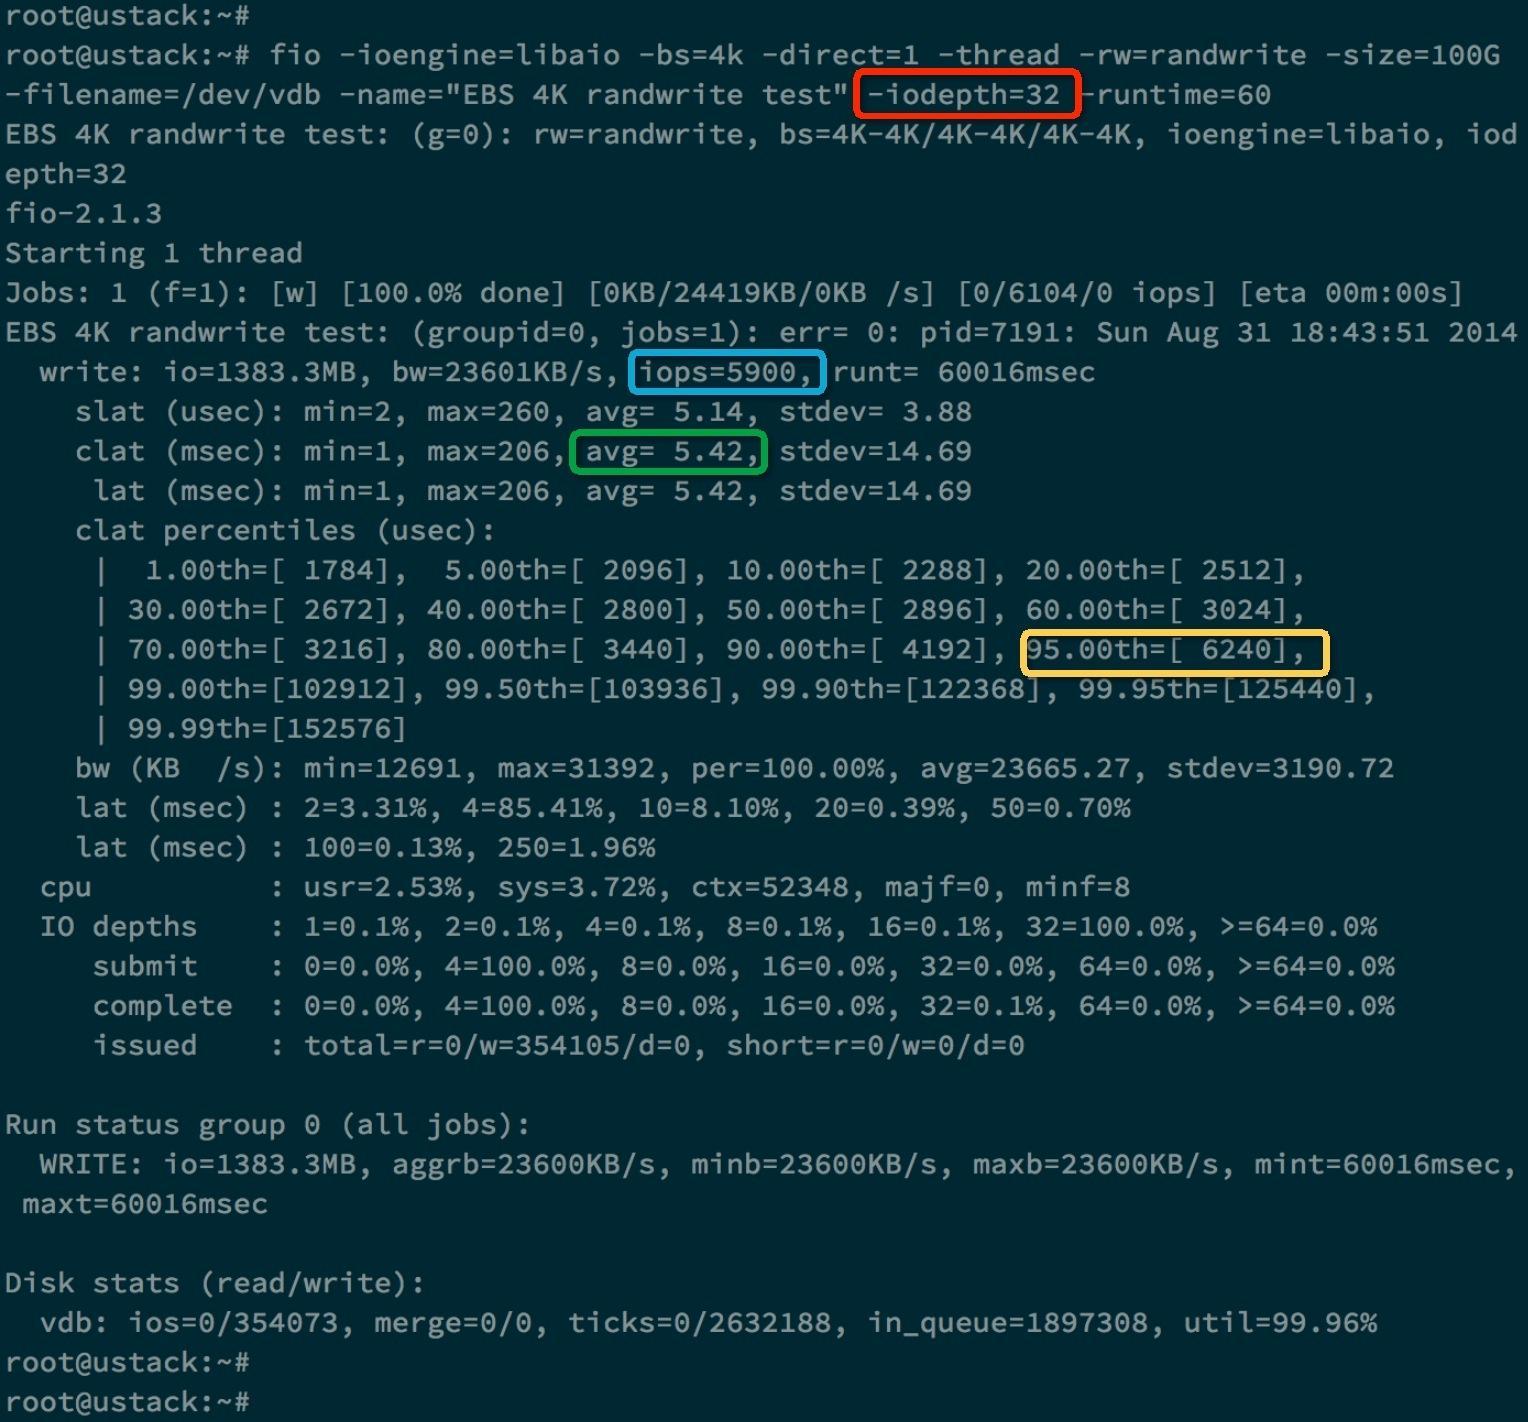 Disk performance indicators - IOPS, throughput and testing